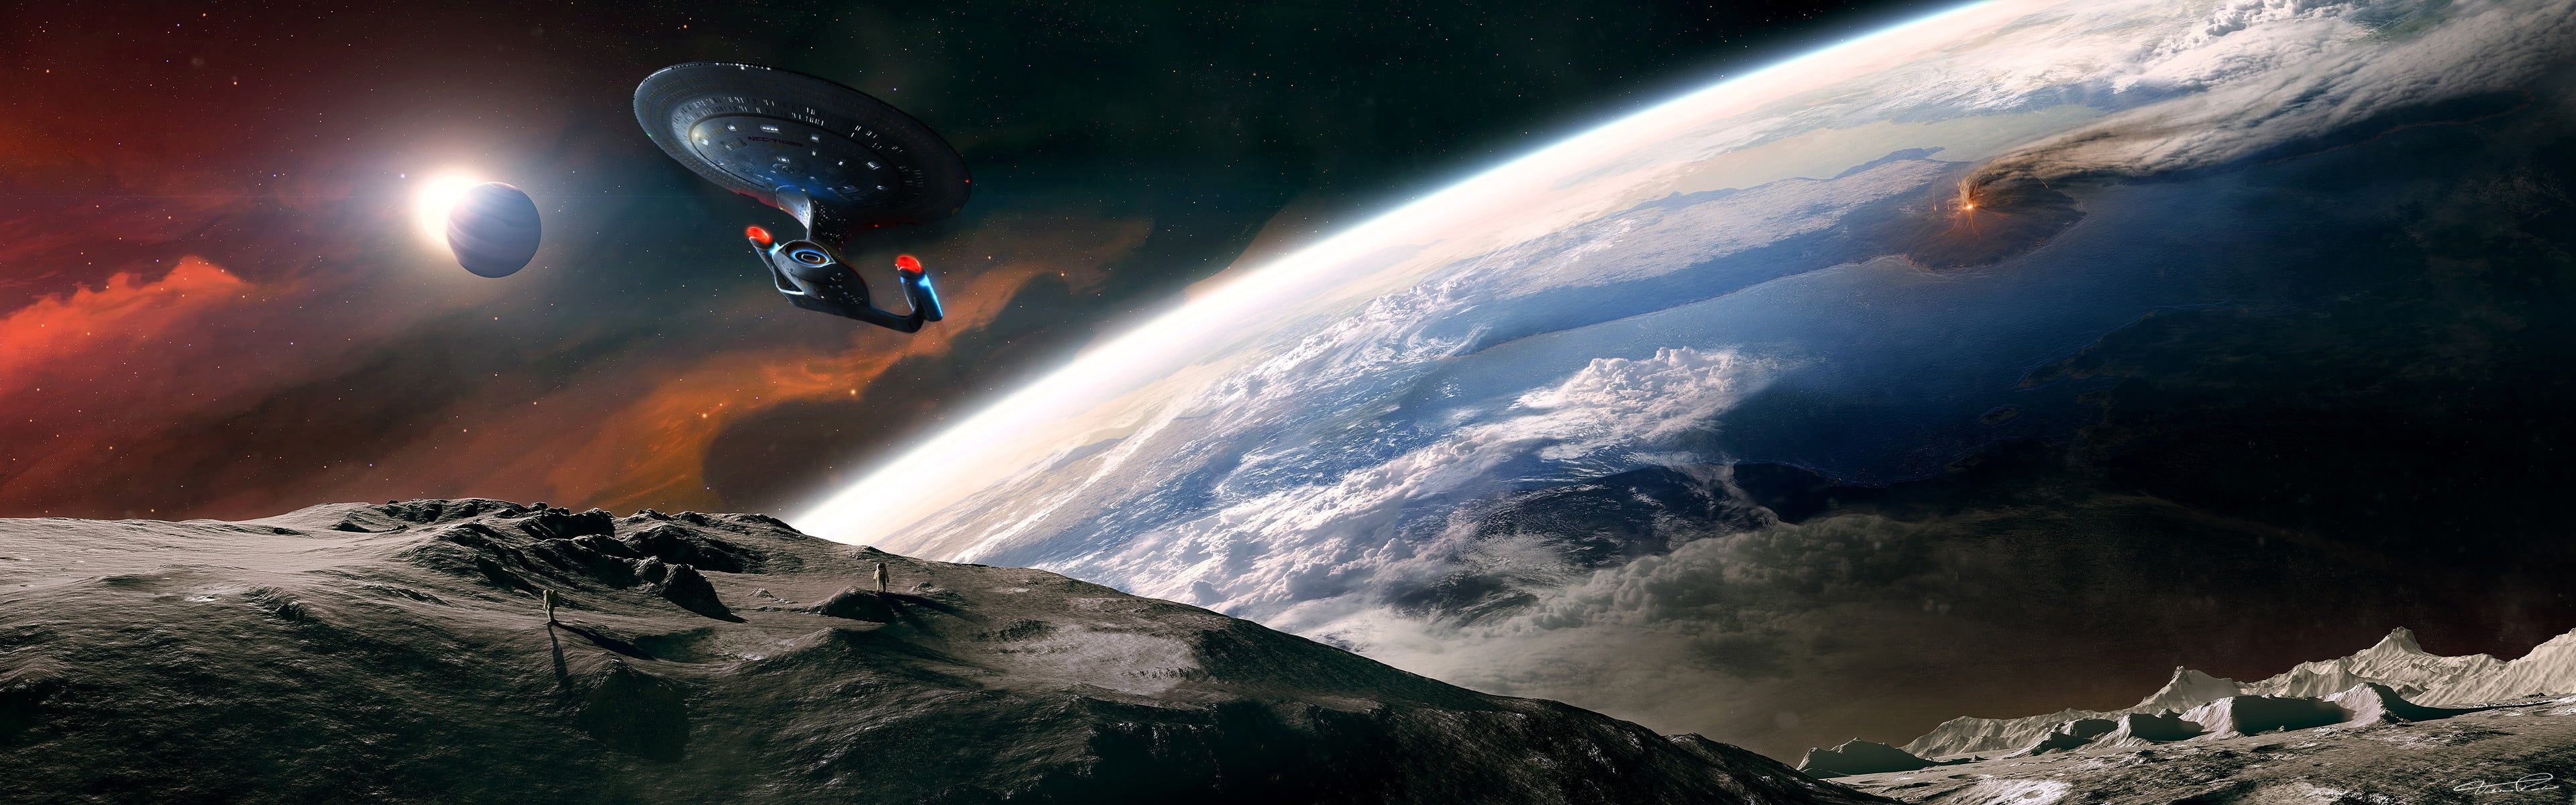 earth illustration Star Trek space spaceship